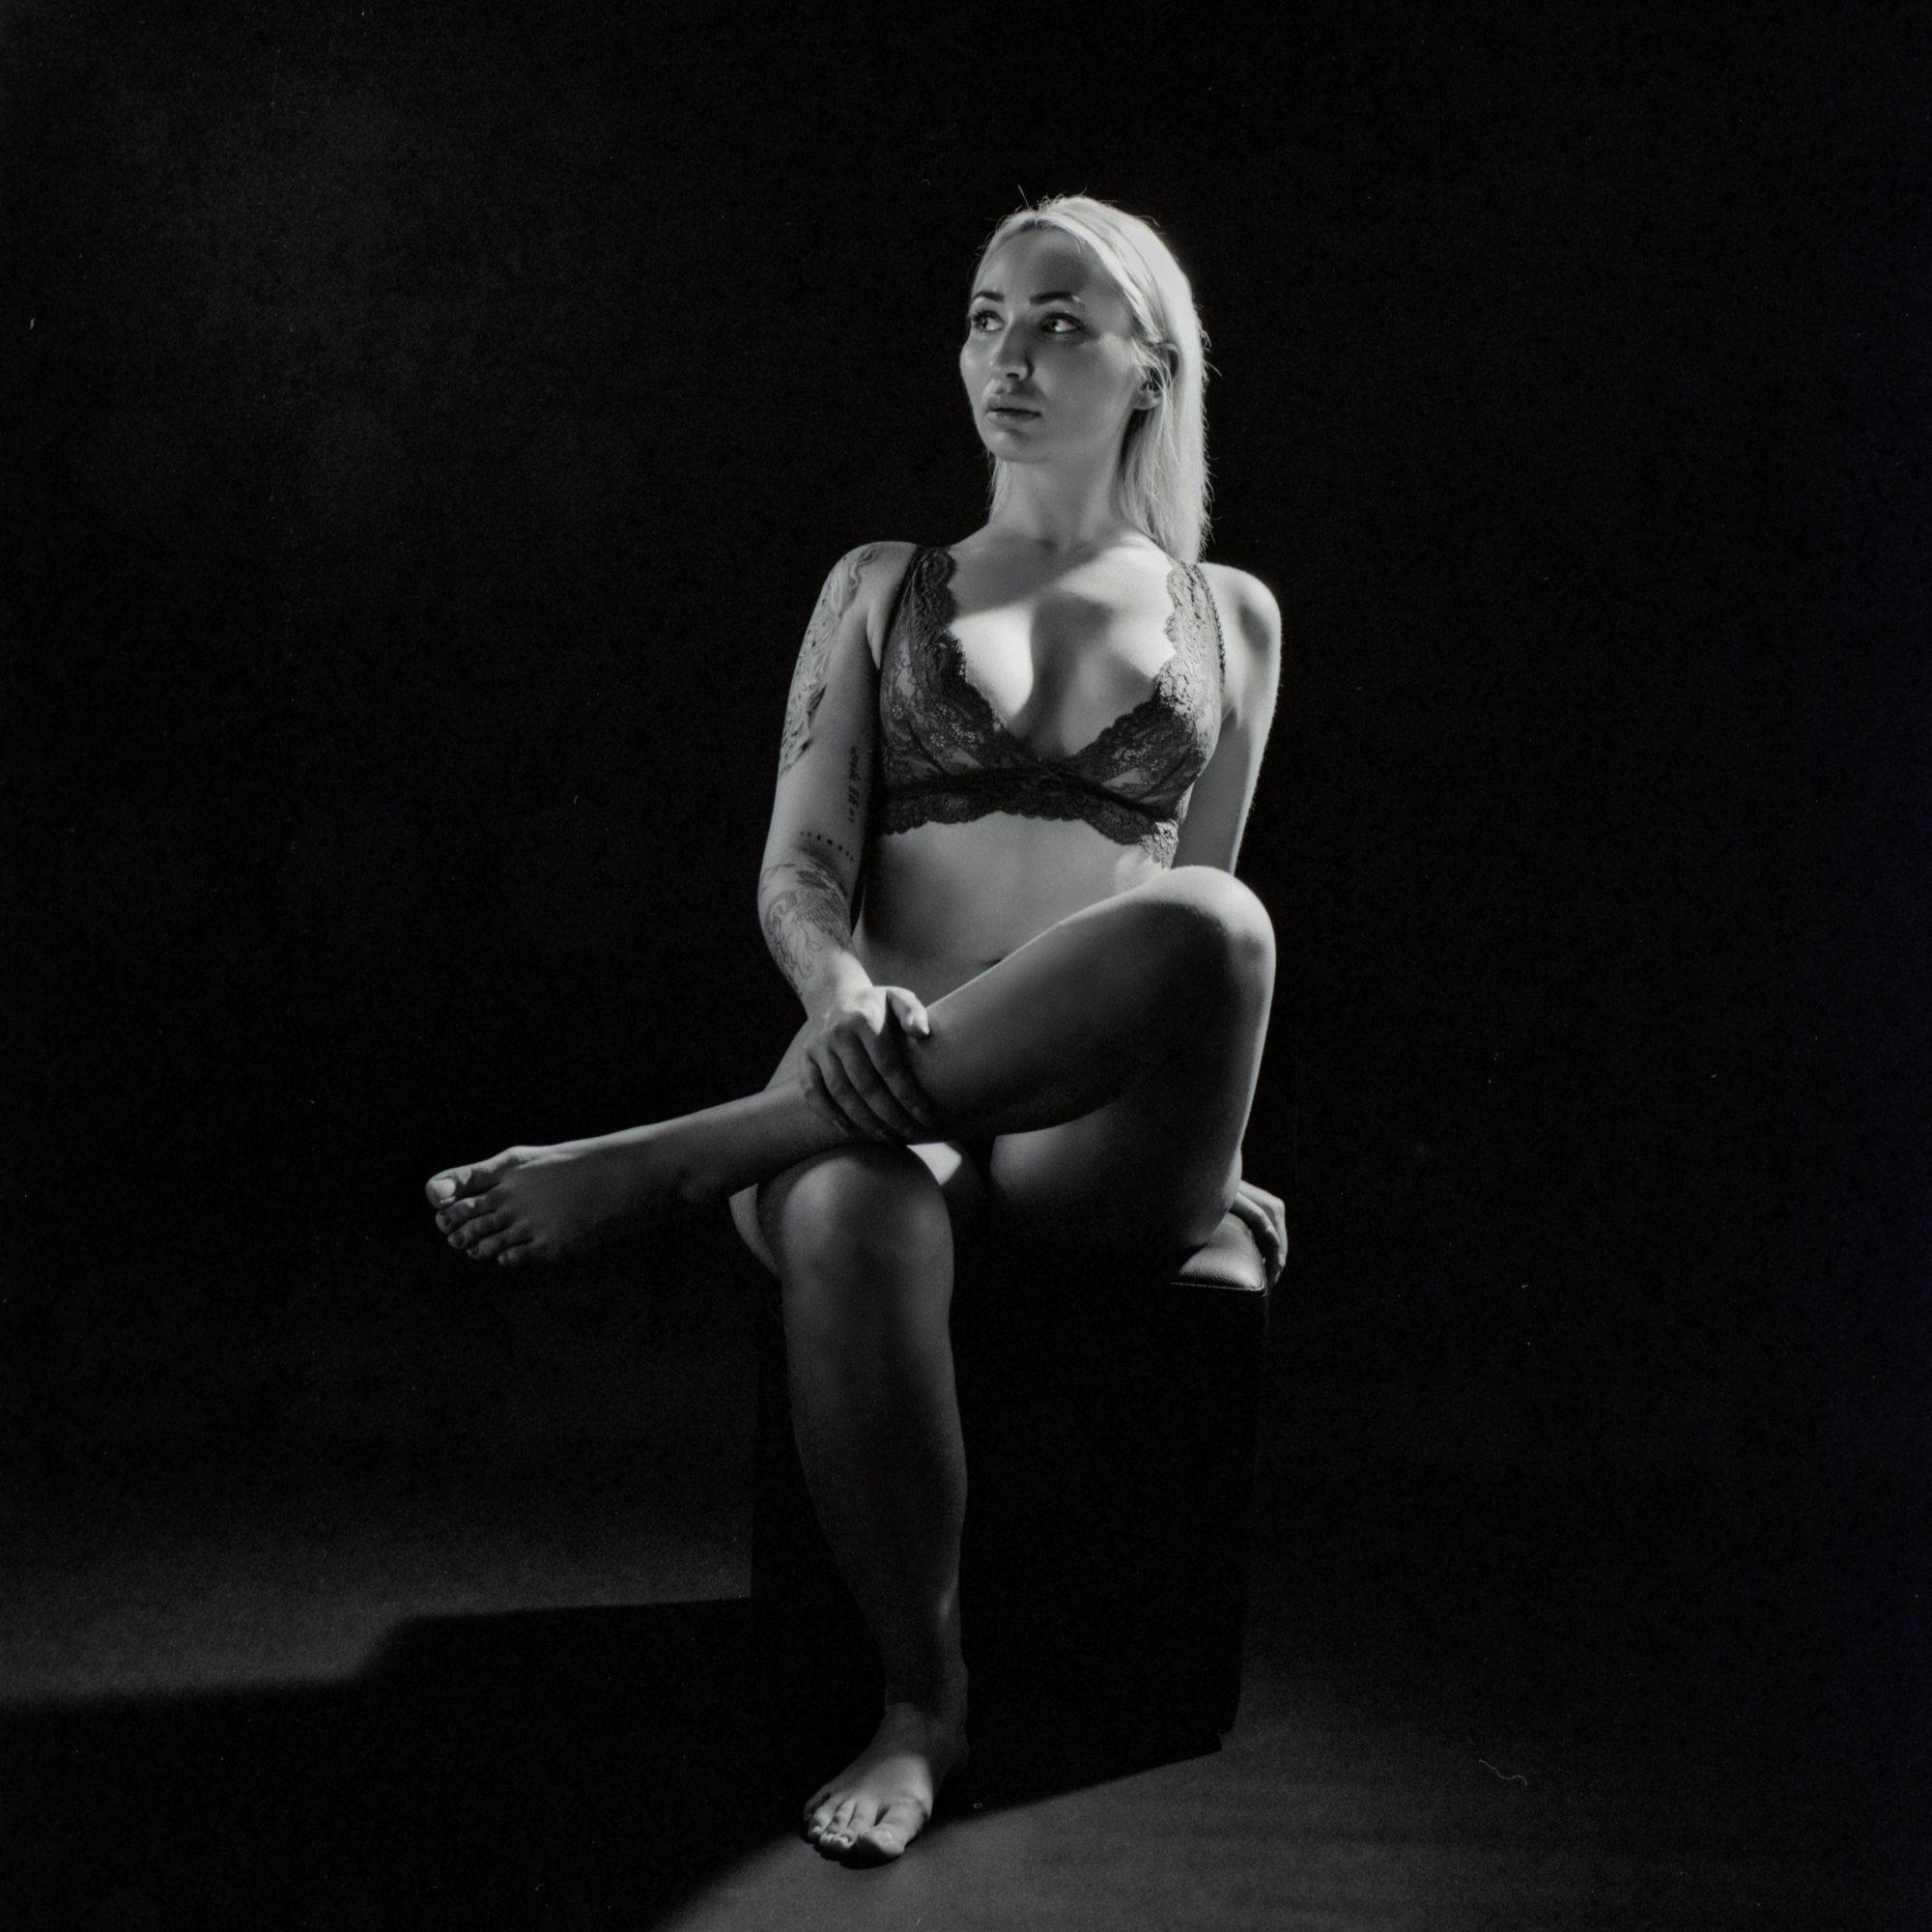 Tattooed model in lingerie (Pic: Iain Compton)